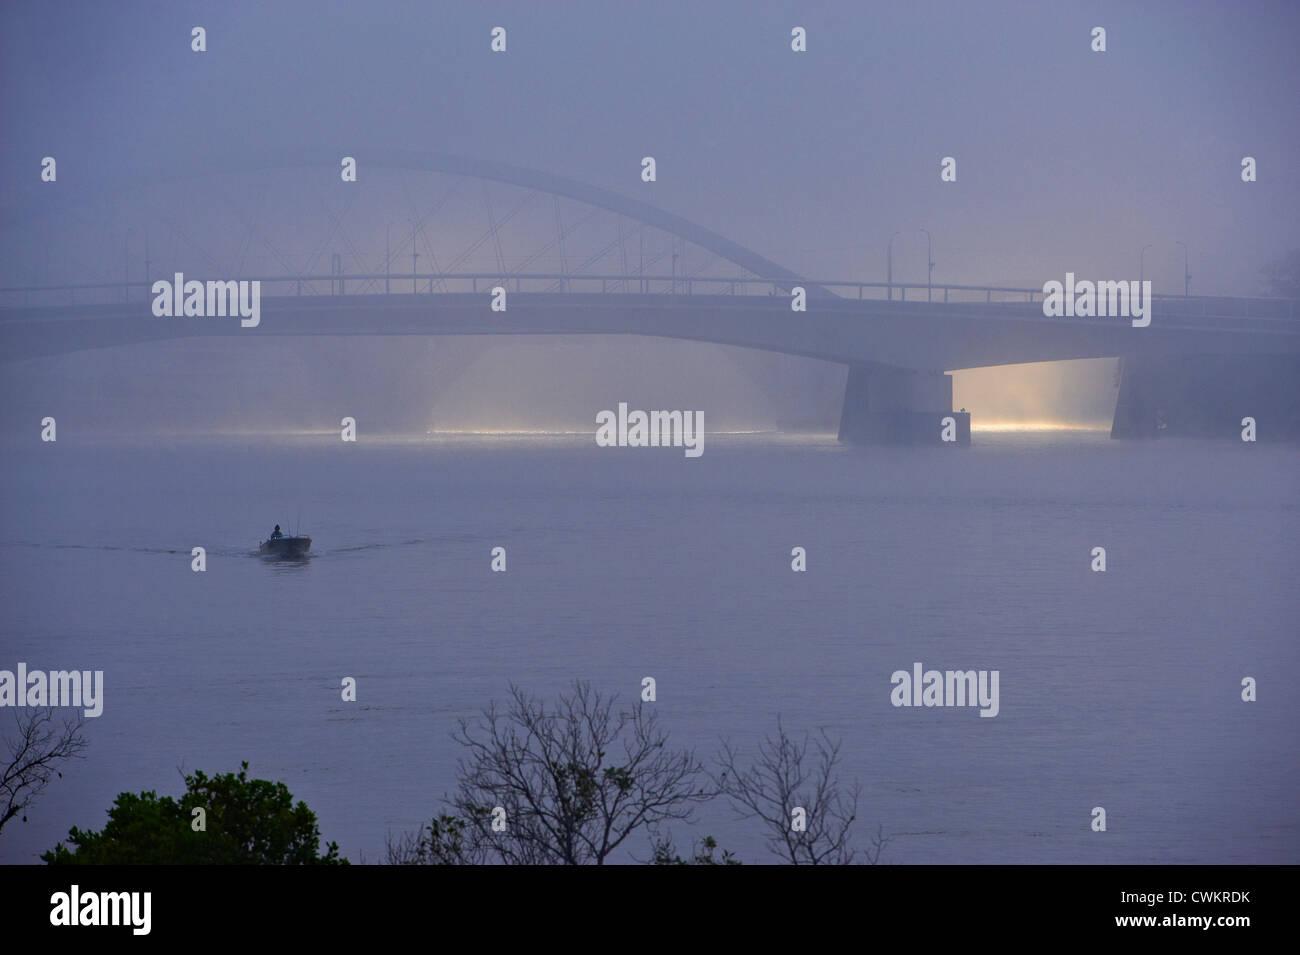 Merivale Bridge, Milton Reach of the Brisbane river in early morning fog, Brisbane Australia - Stock Image